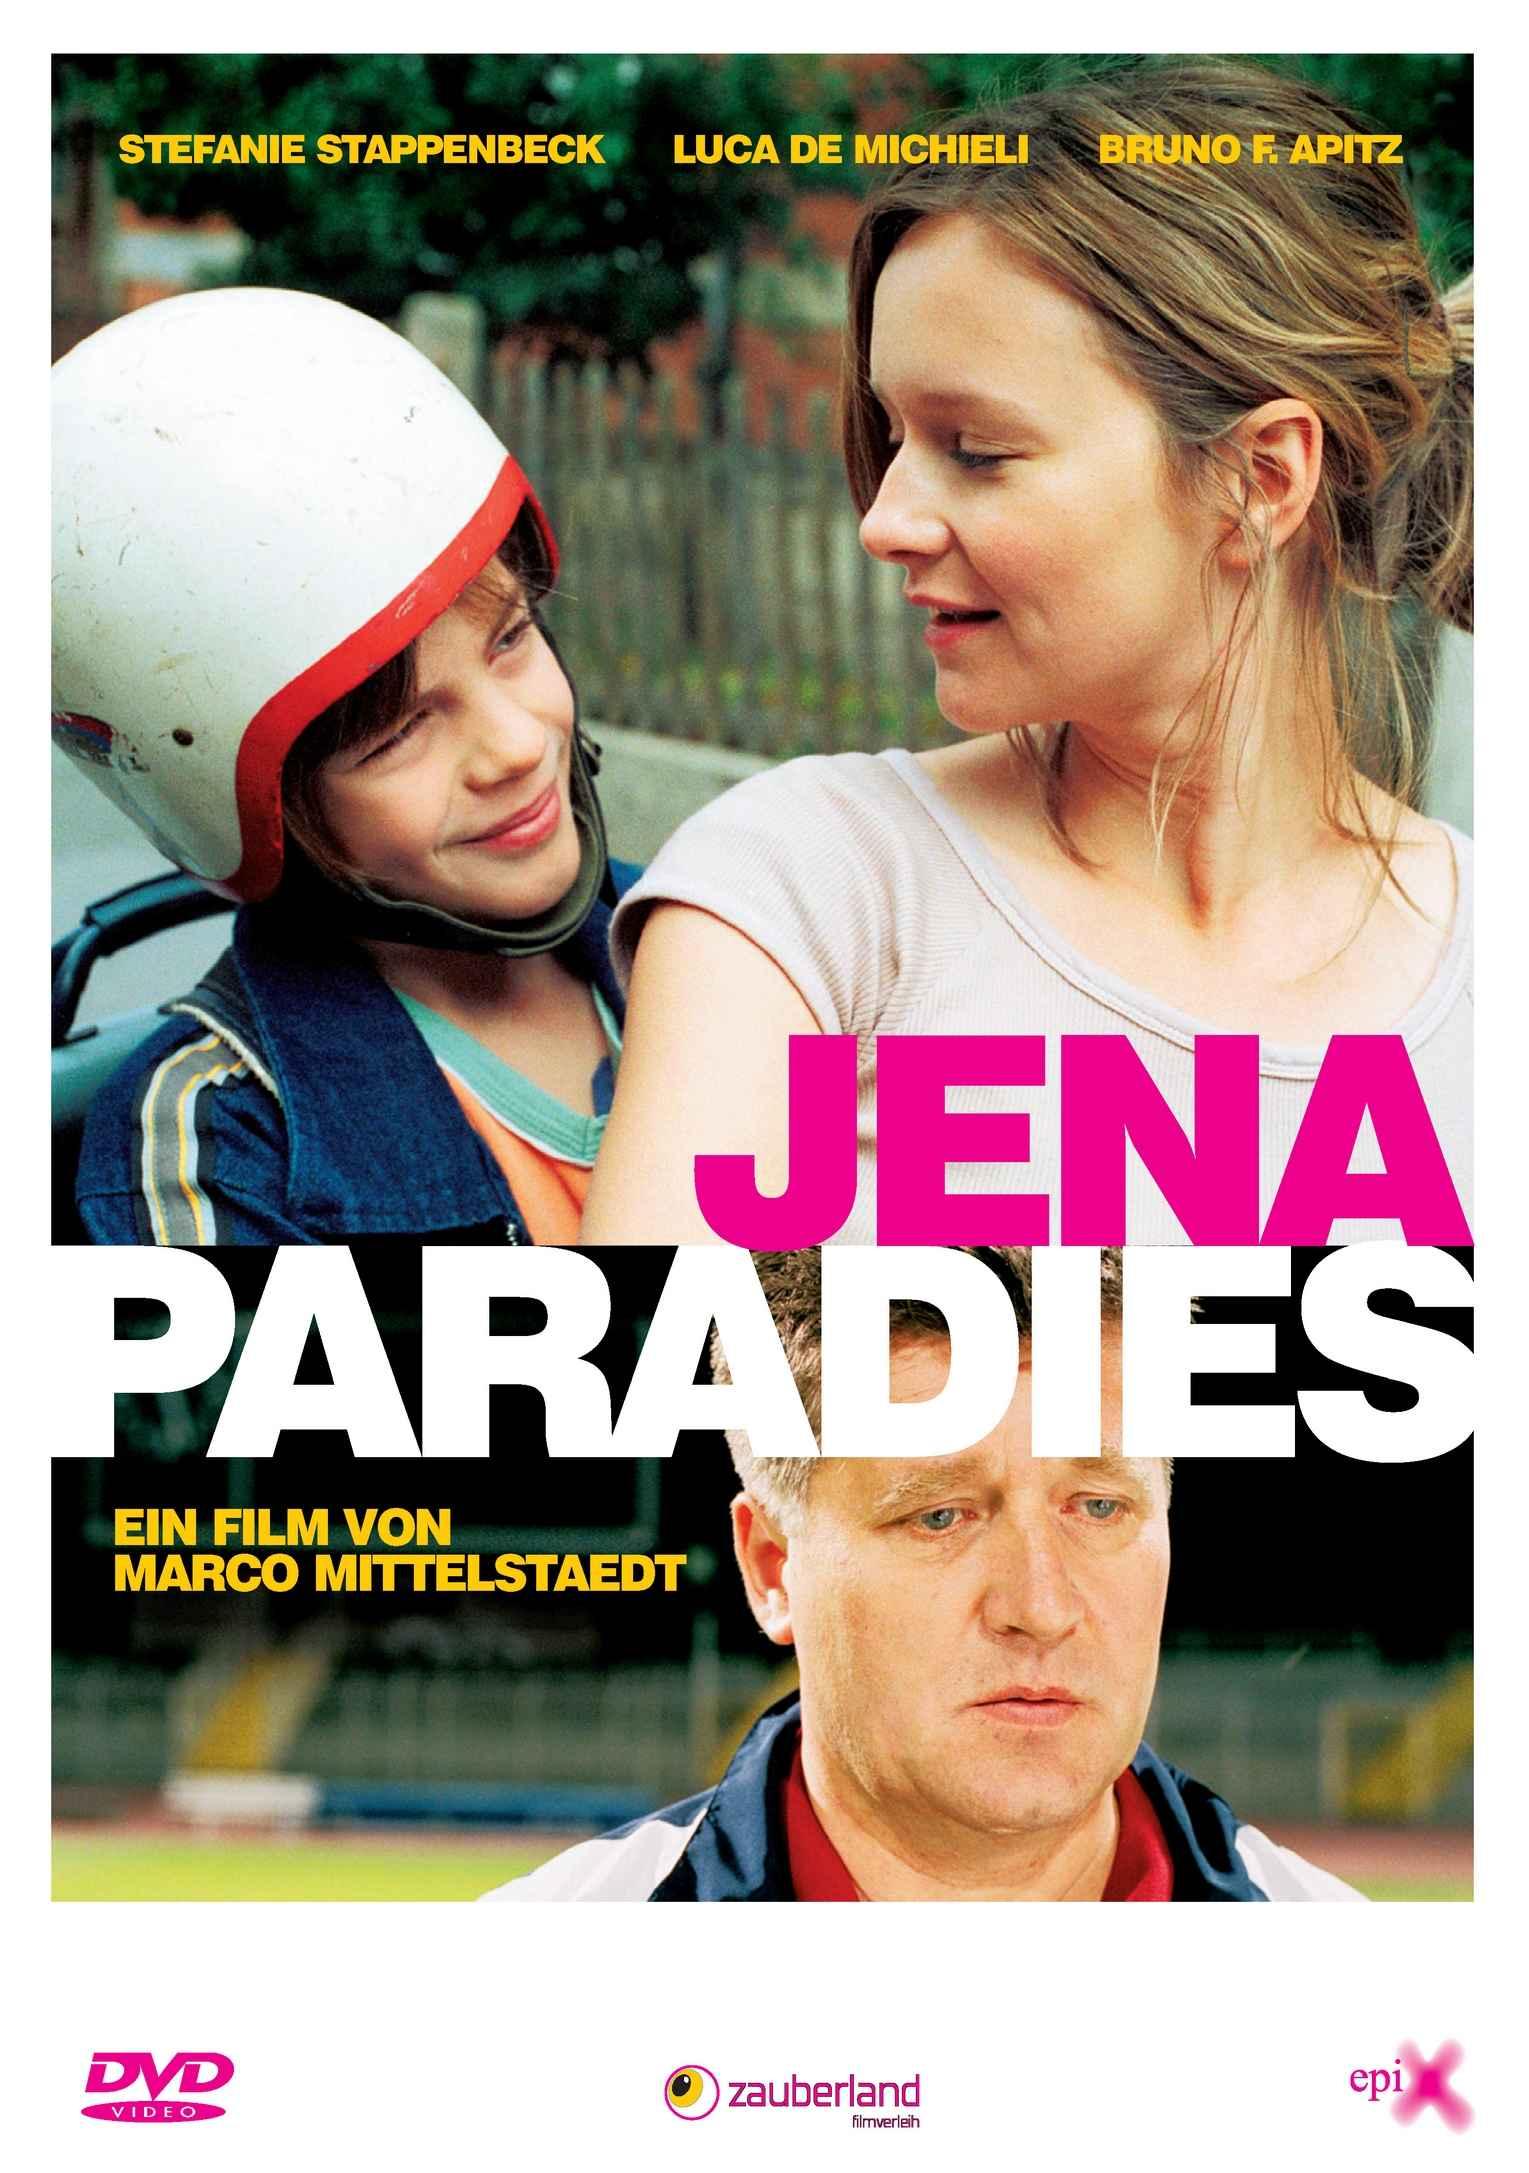 JENA PARADIES Frontcover final